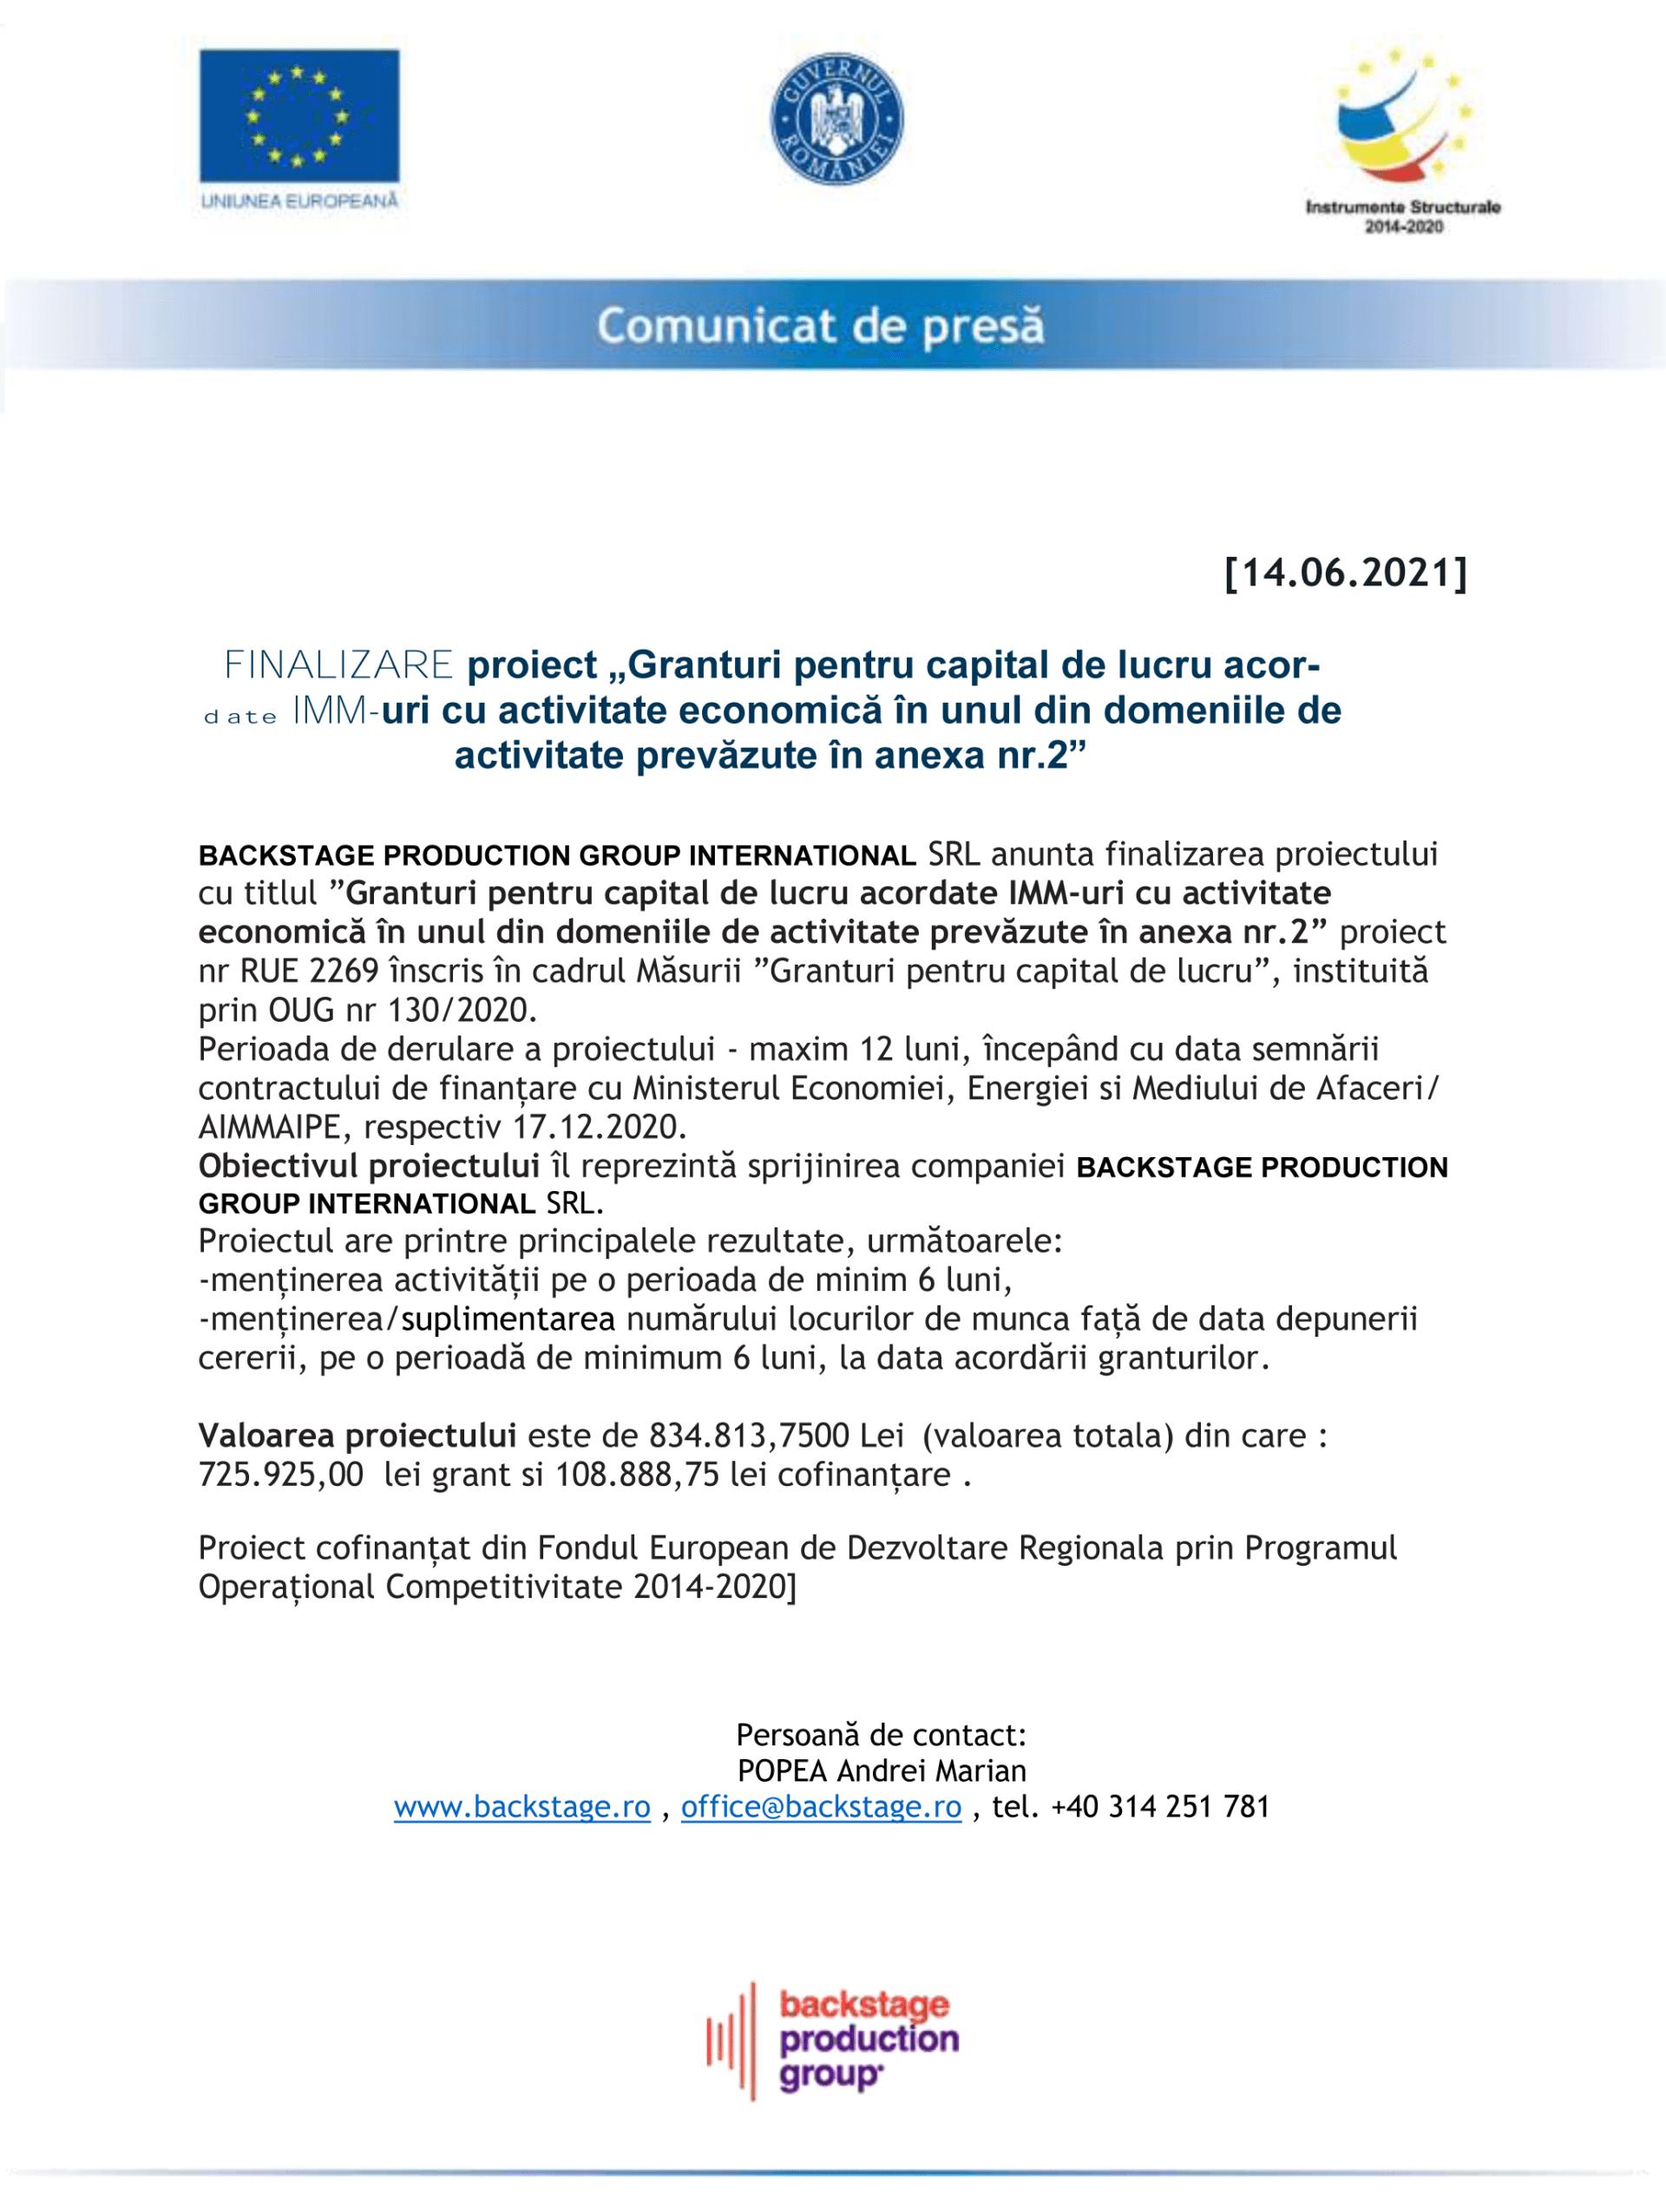 3.-Comunicat_de_Presa_FINALIZARE_BackStage_14.06